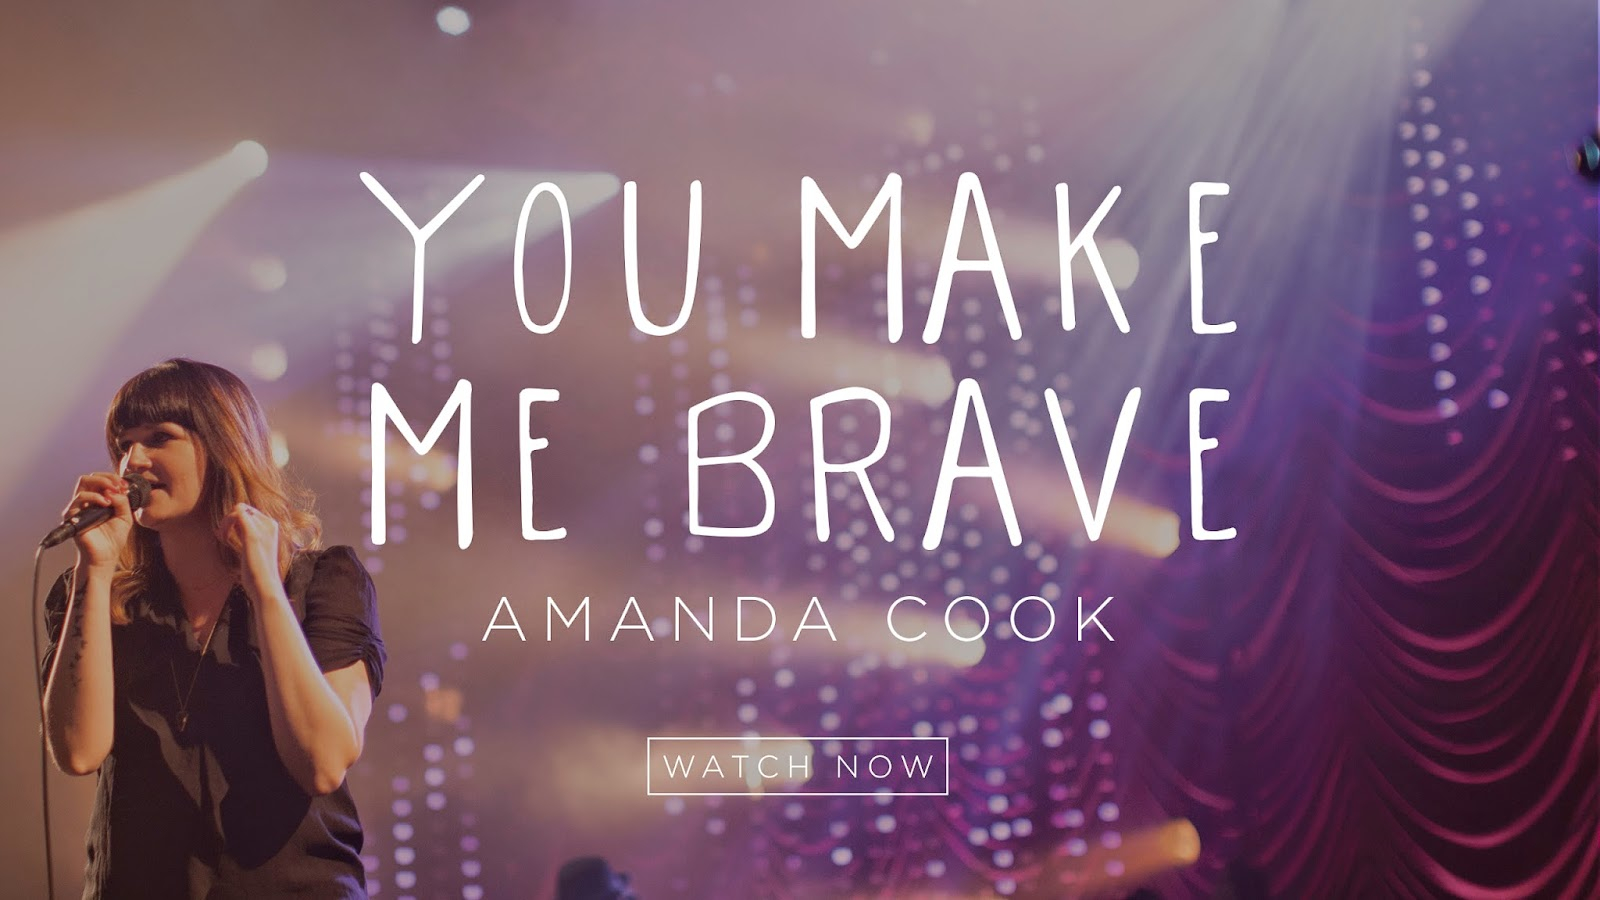 You Make Me Brave Chords You Make Me Brave Amanda Cook From Bethel Music Jakes Olivier